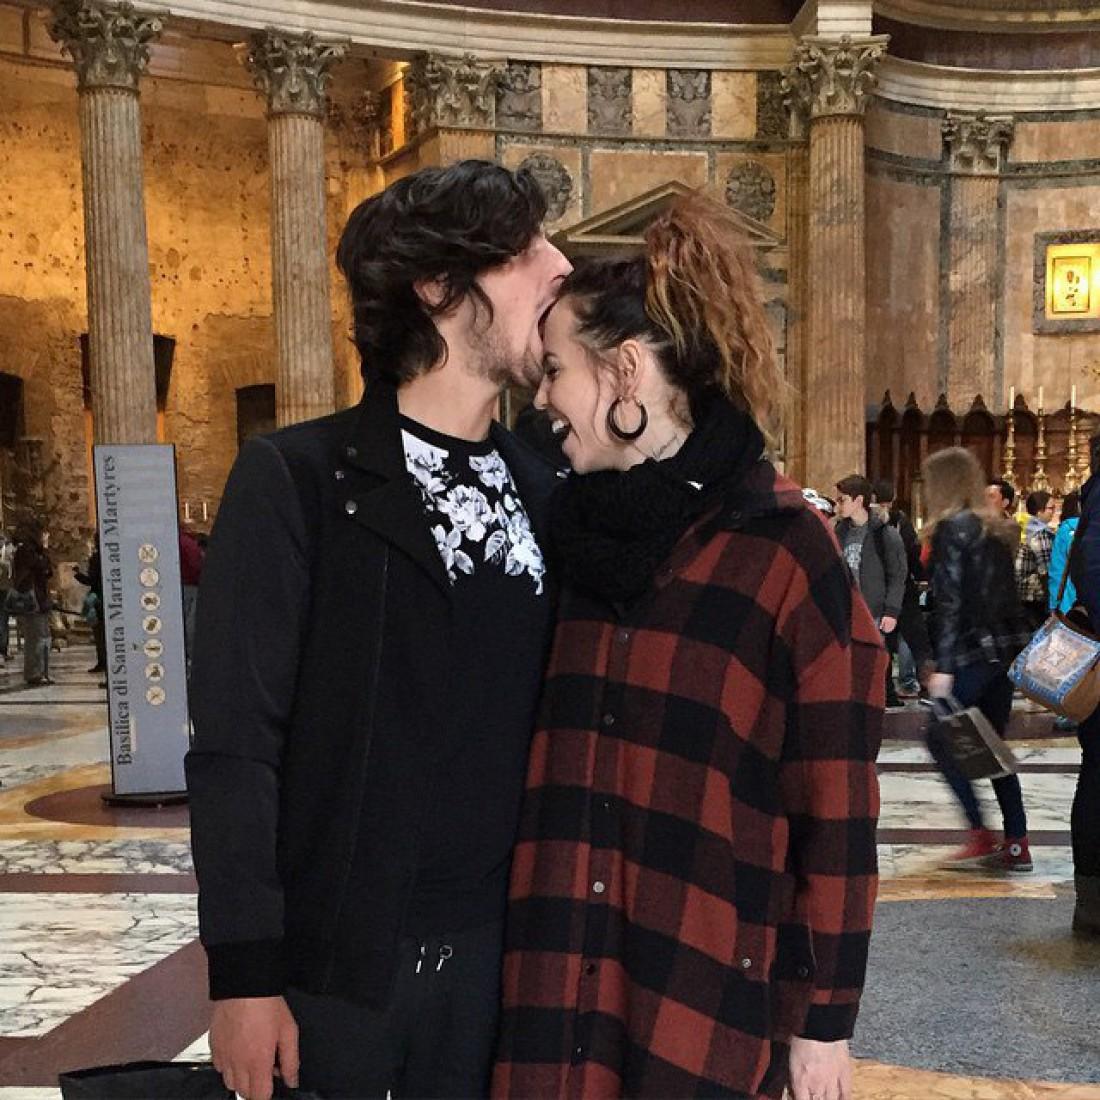 Пара познакомилась в 2012 году